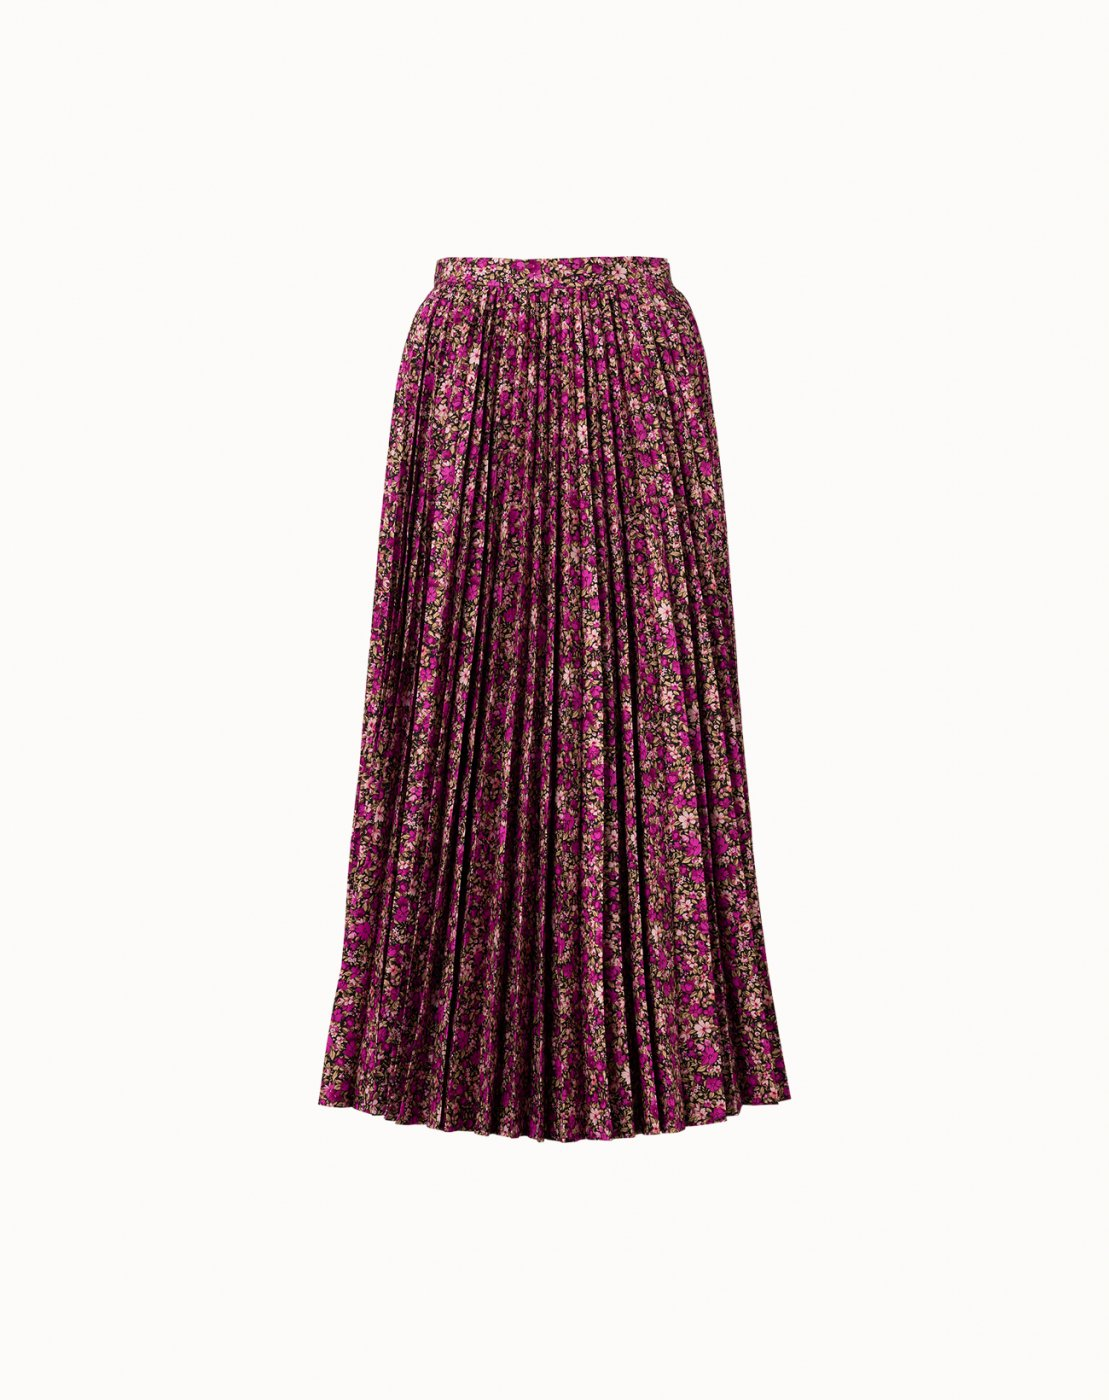 leur logette - Mini Flower Cotton Pleats Skirt - Dark Pink